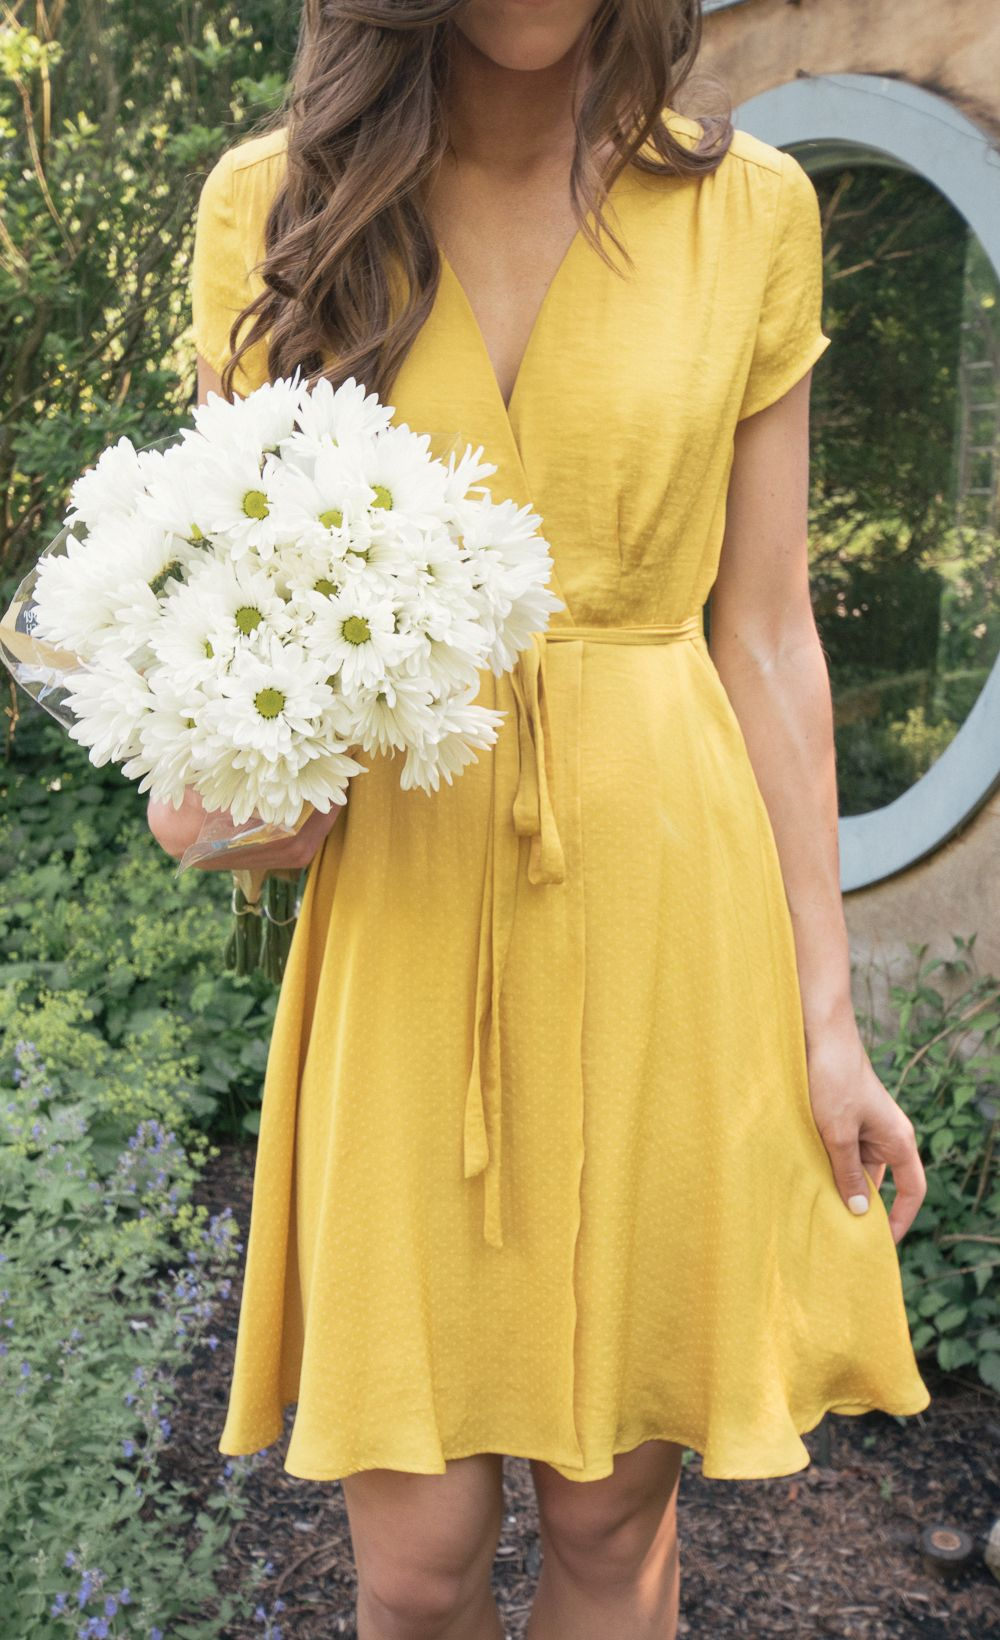 Shop Till You Drop Showit Blog Yellow Dress Outfit Yellow Dress Summer Summer Outfits Women [ 1640 x 1000 Pixel ]